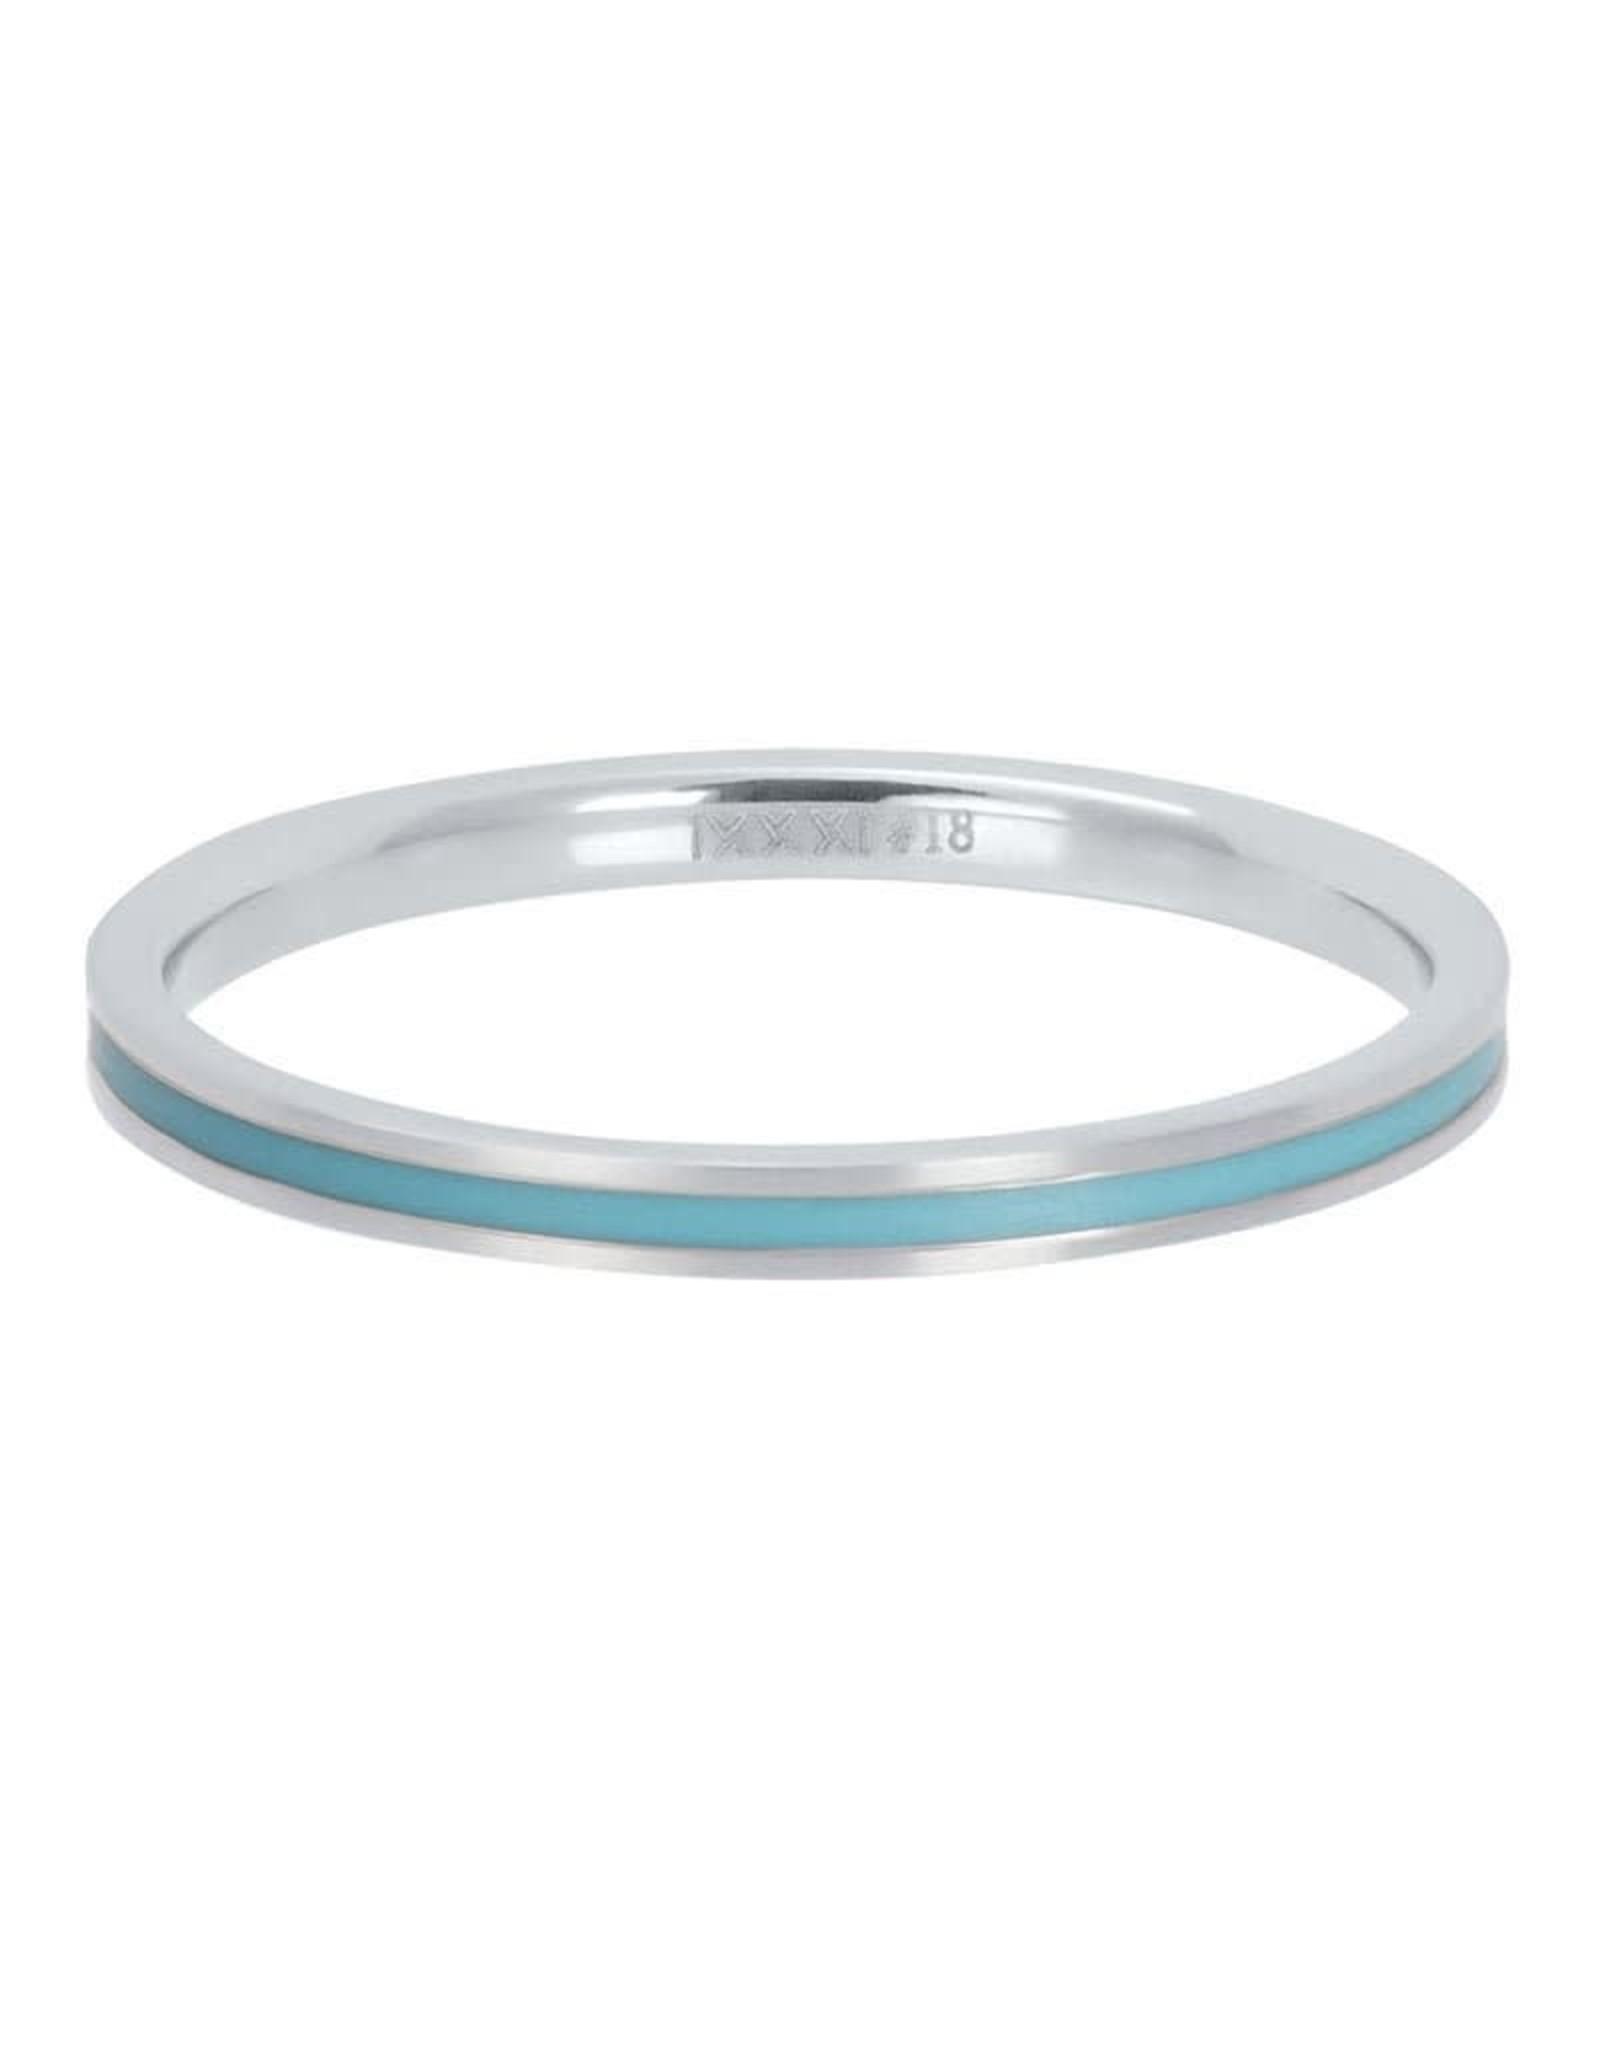 iXXXi Jewelry iXXXi vulring line turquoise